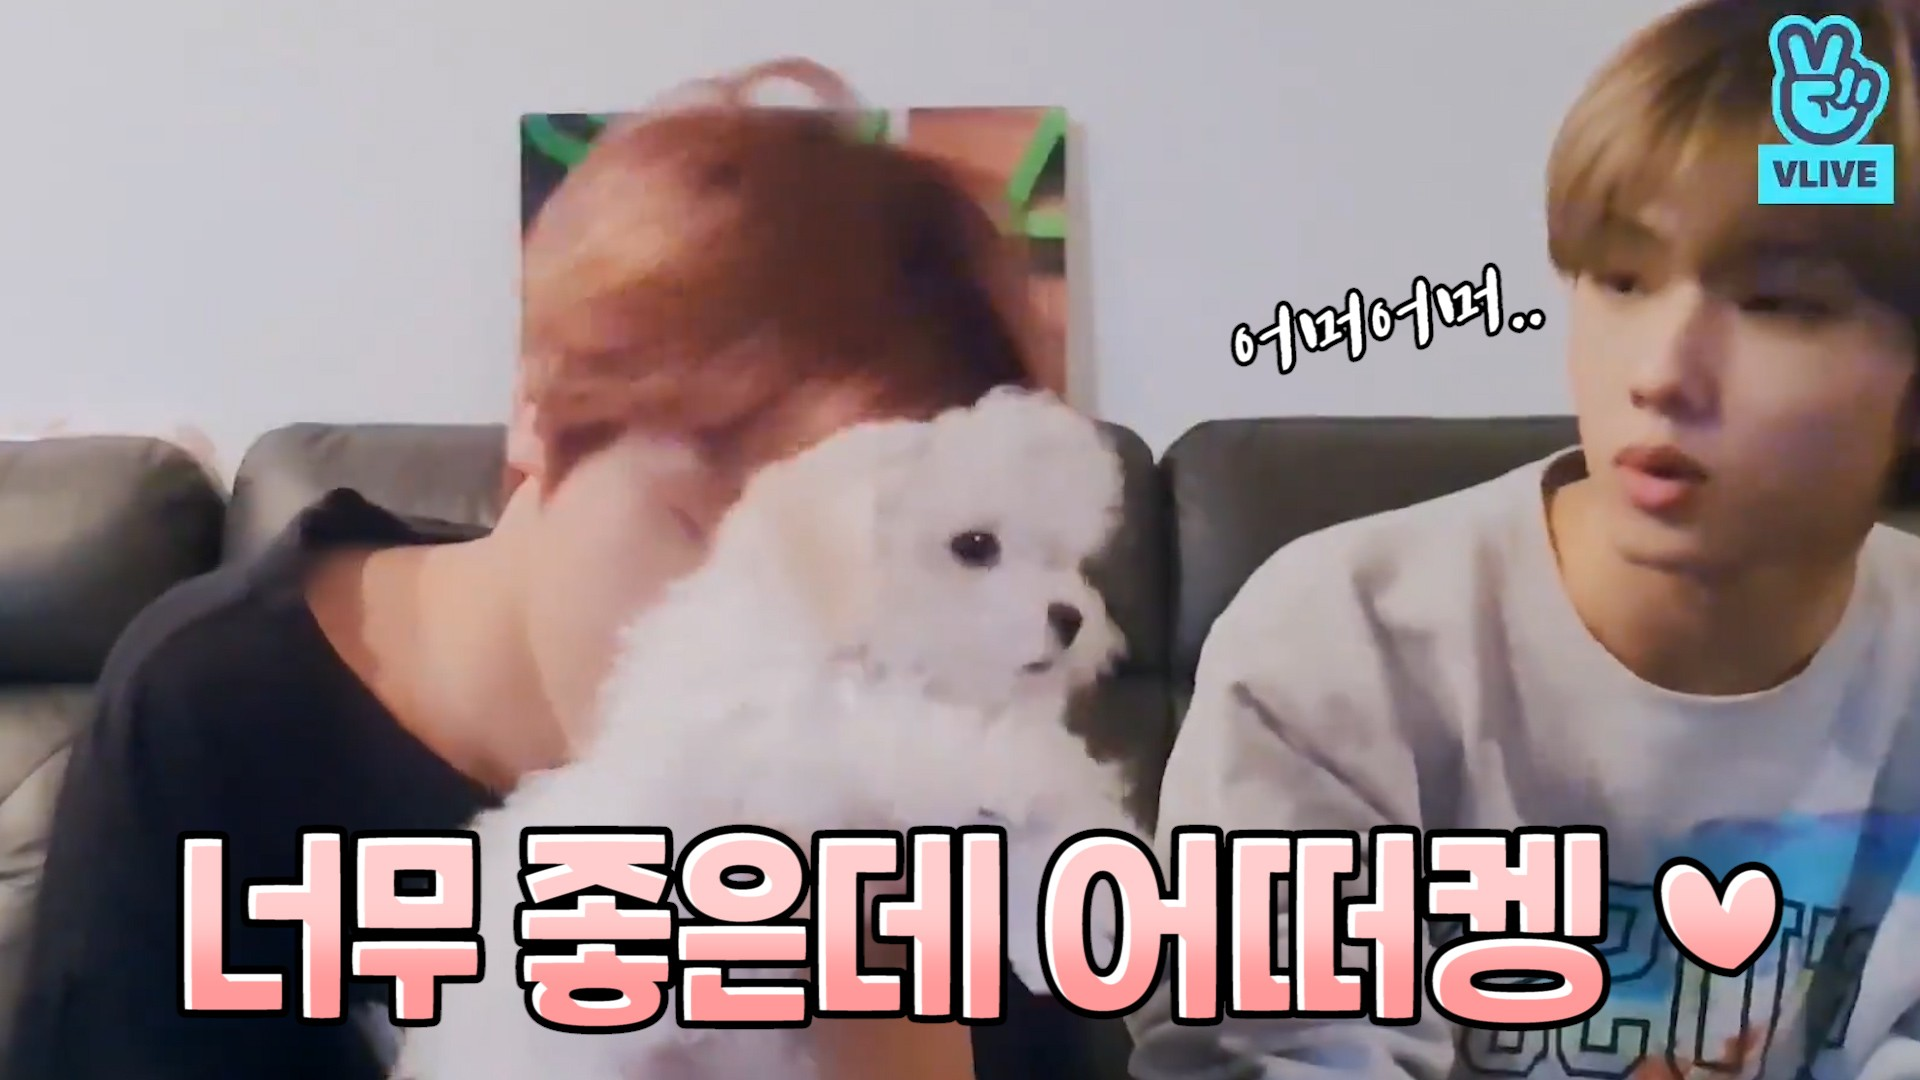 [NCT] 대갈공주 브이앱 데뷔 귀엽고 난리나요..🐶💚 (So cute CHENLE's puppy)